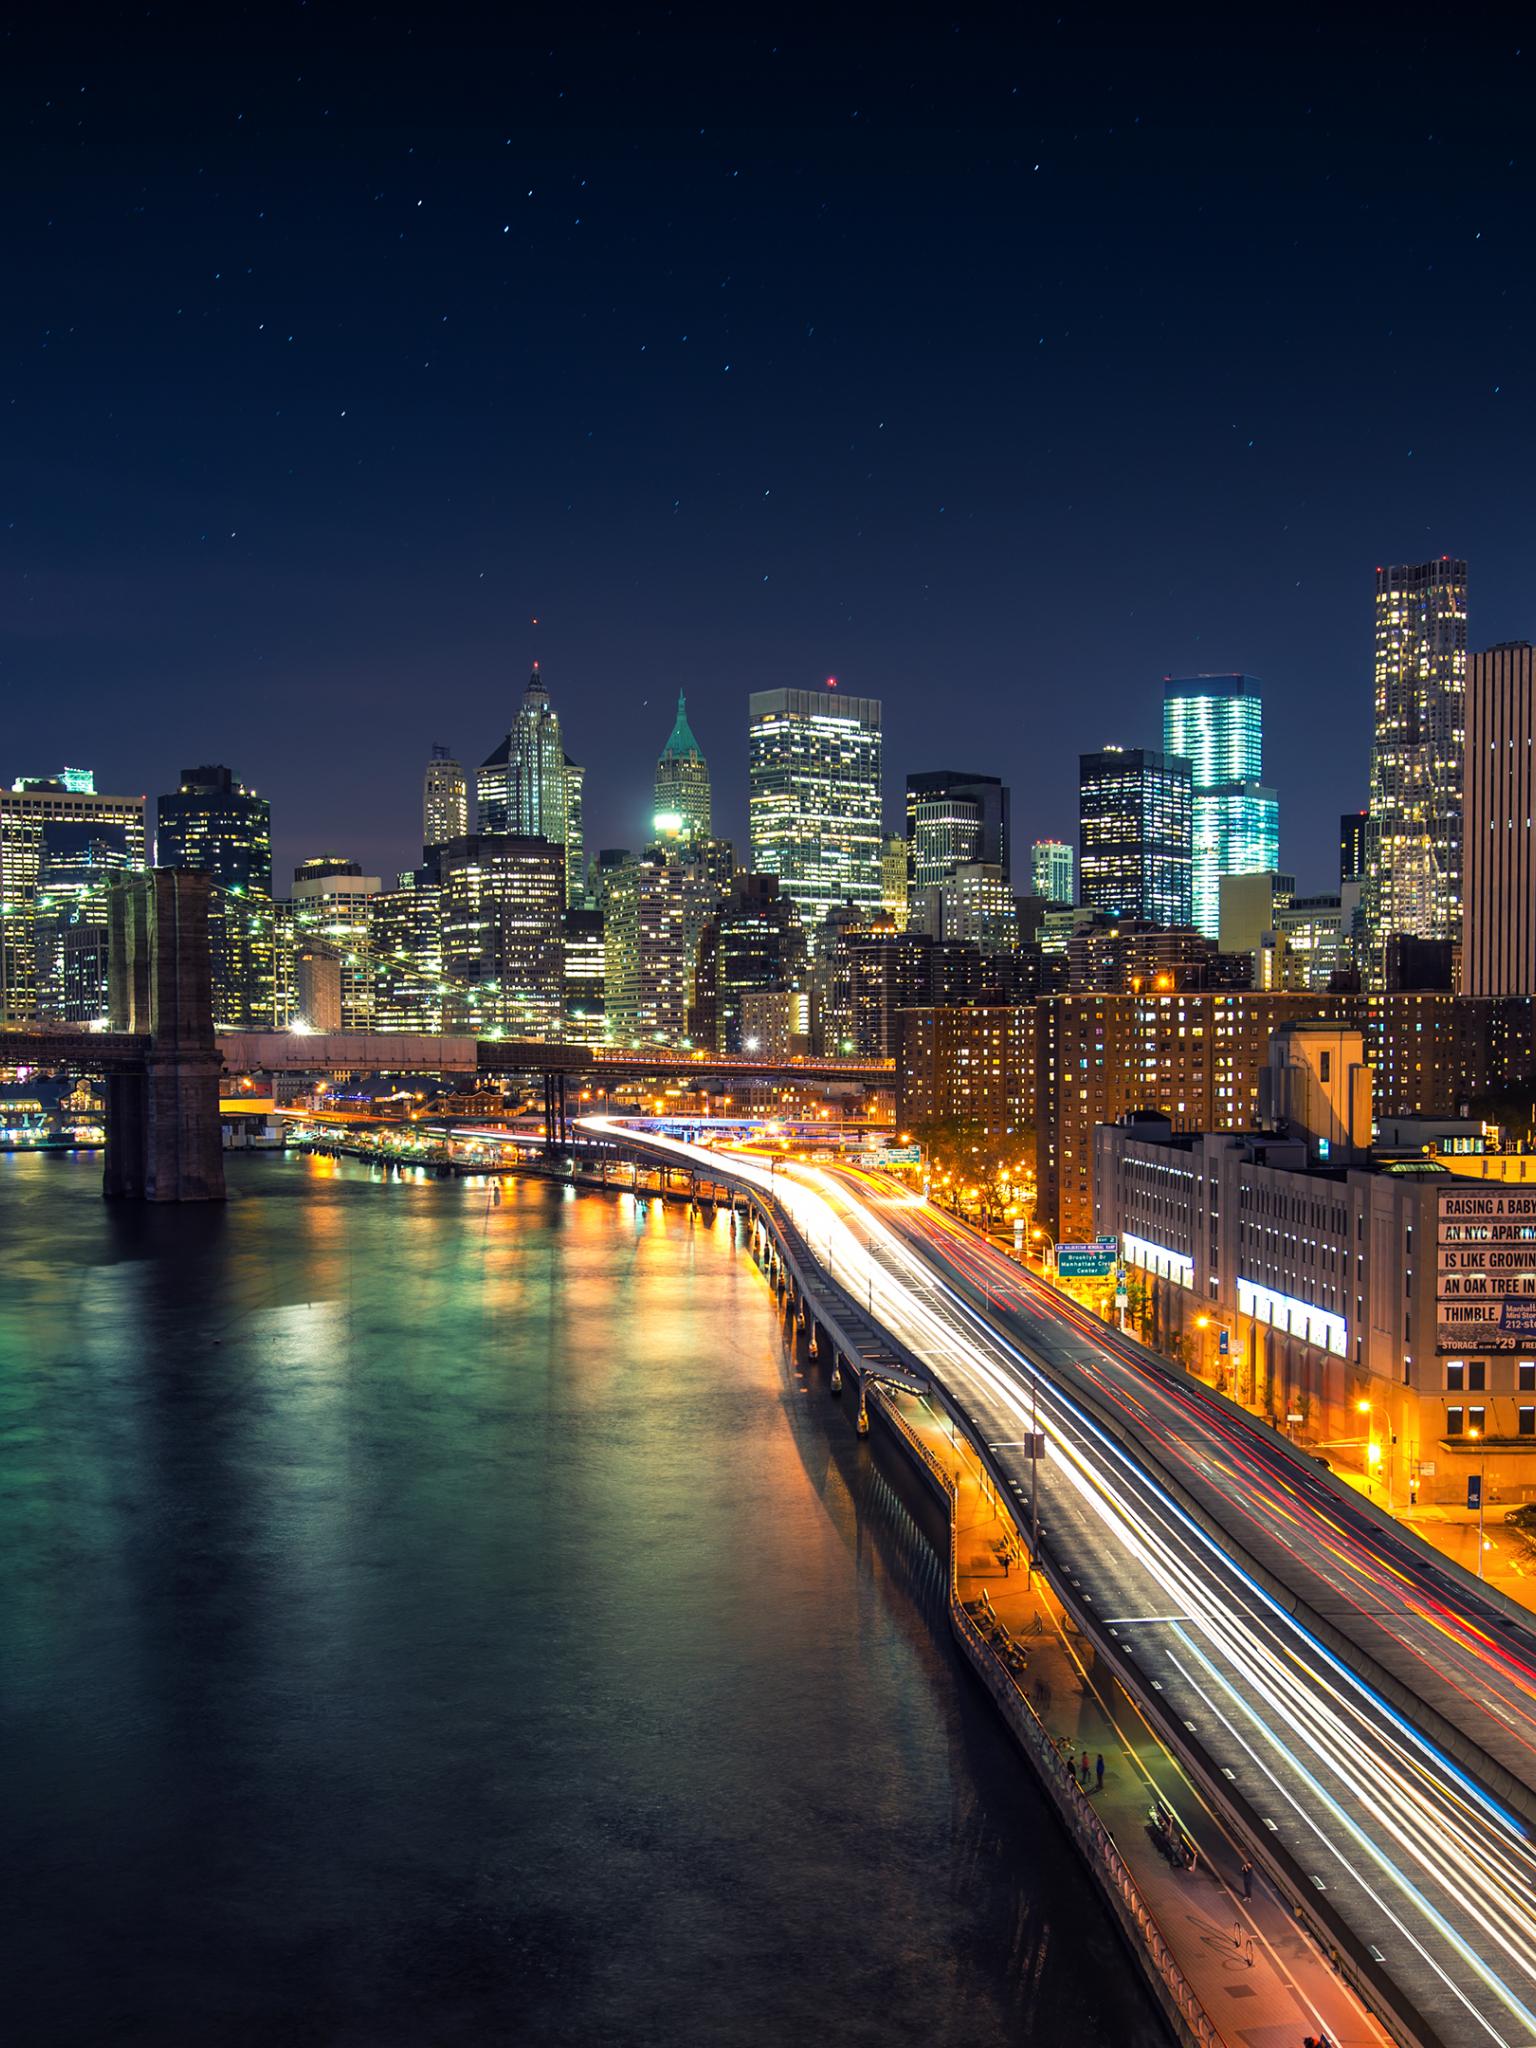 Free download City Night Wallpaper 4k Desktop Backgrounds ...